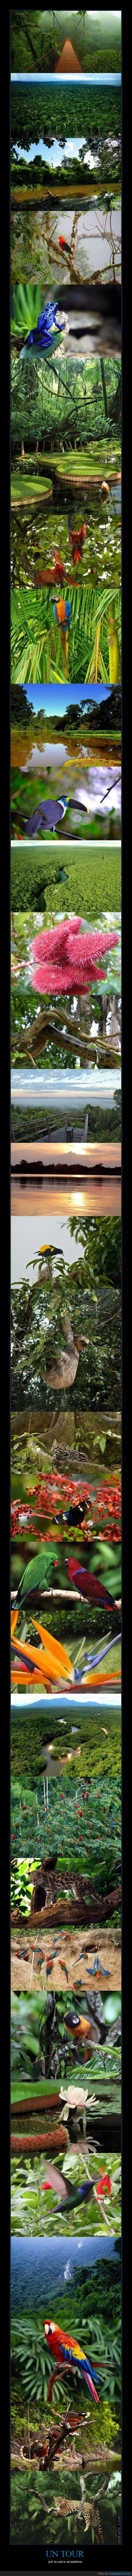 amazonas,selva